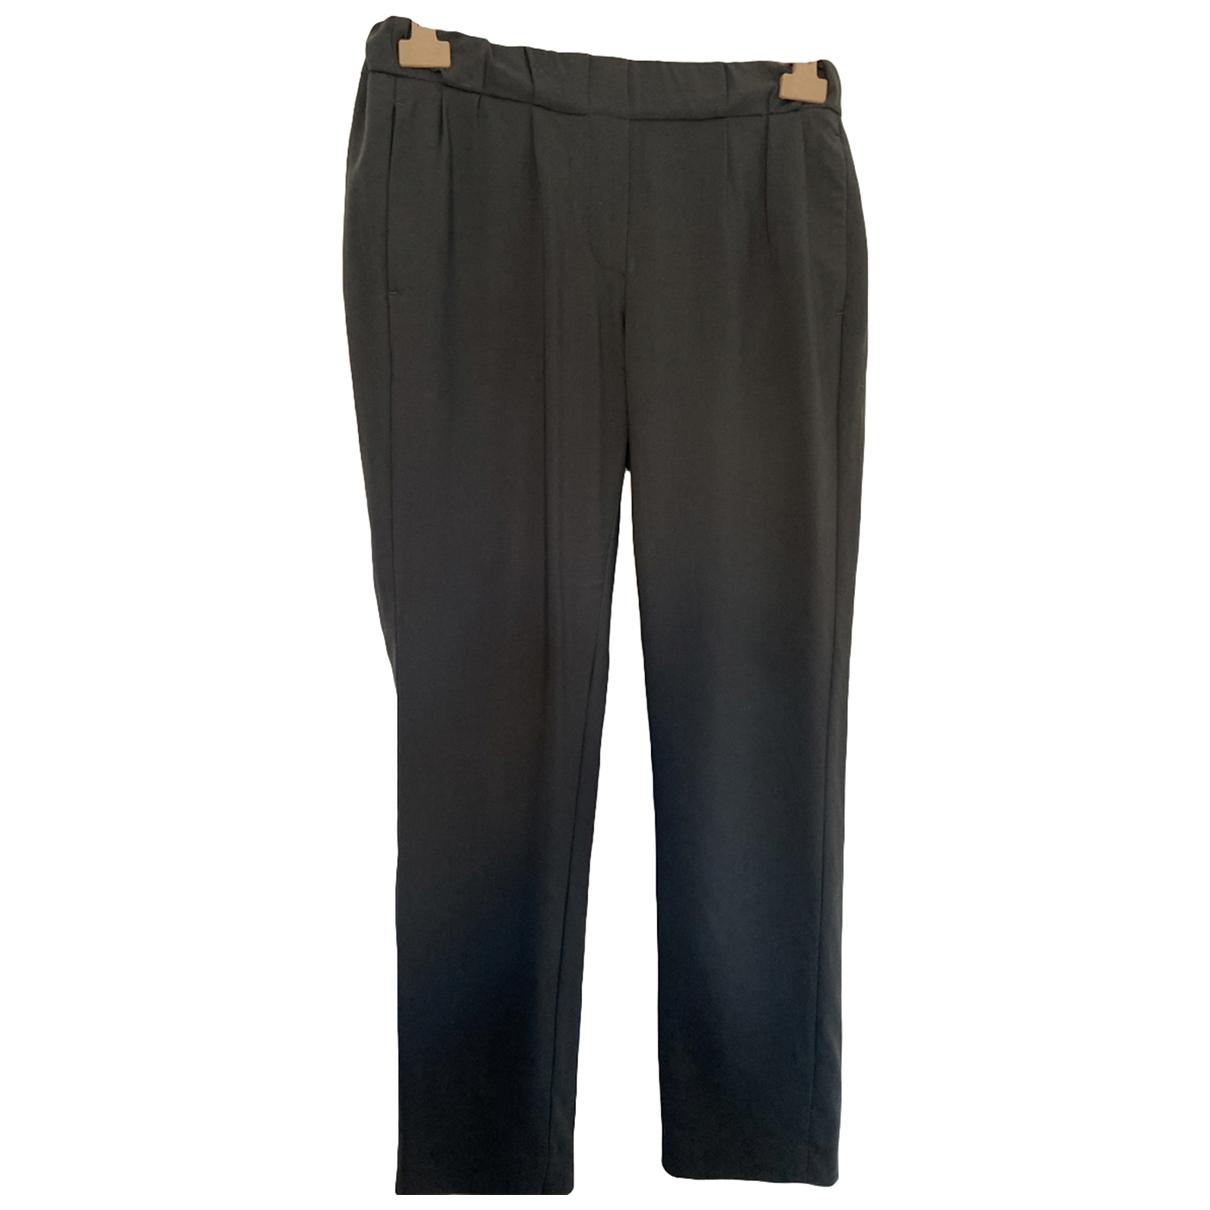 Brunello Cucinelli \N Charcoal Wool Trousers for Women 40